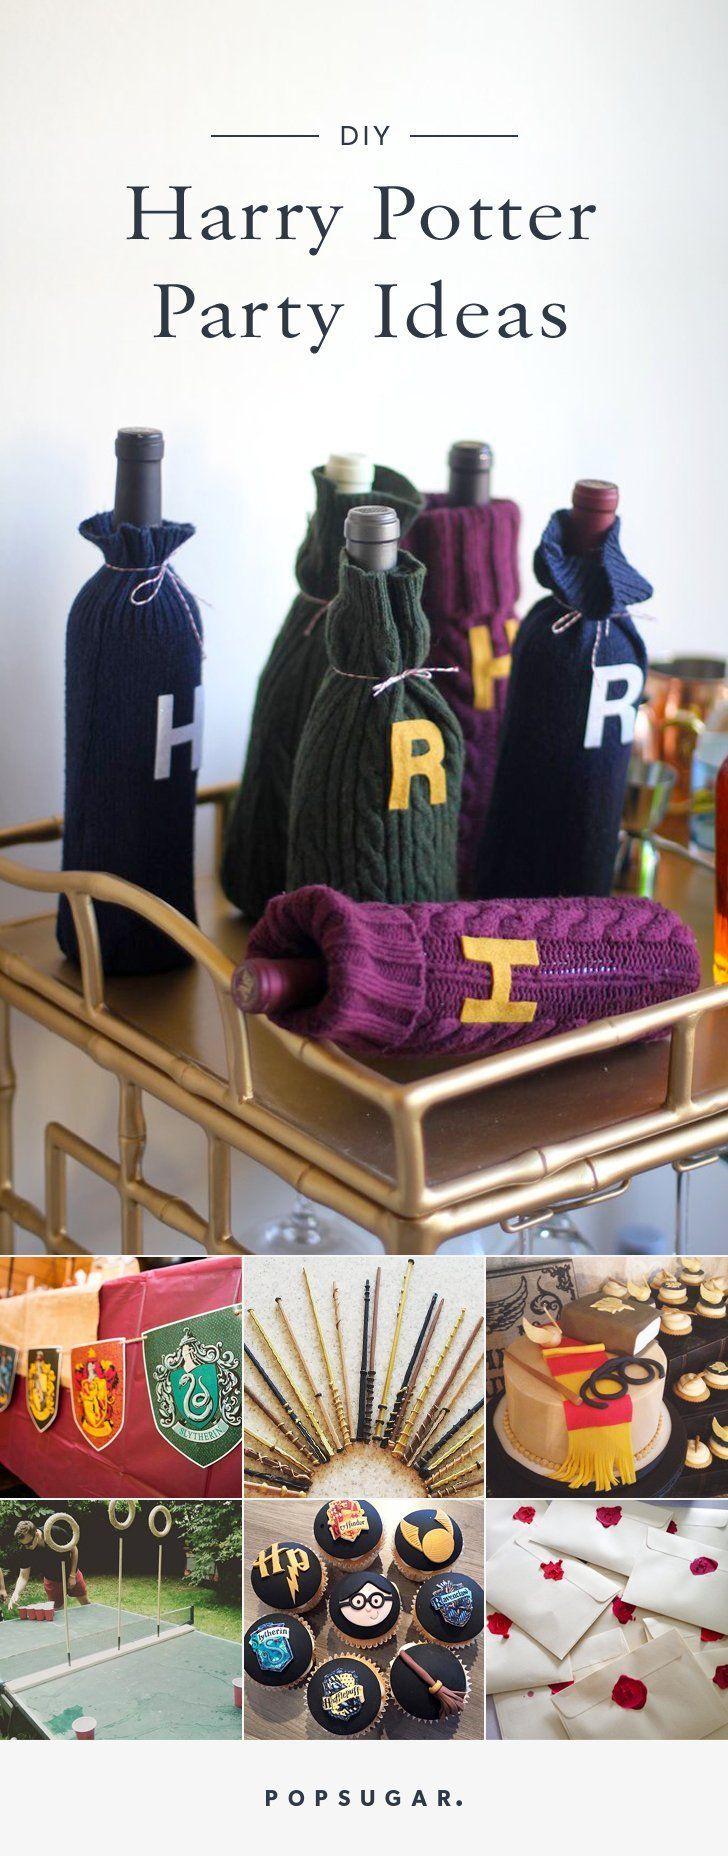 DIY Harry Potter Party Ideas